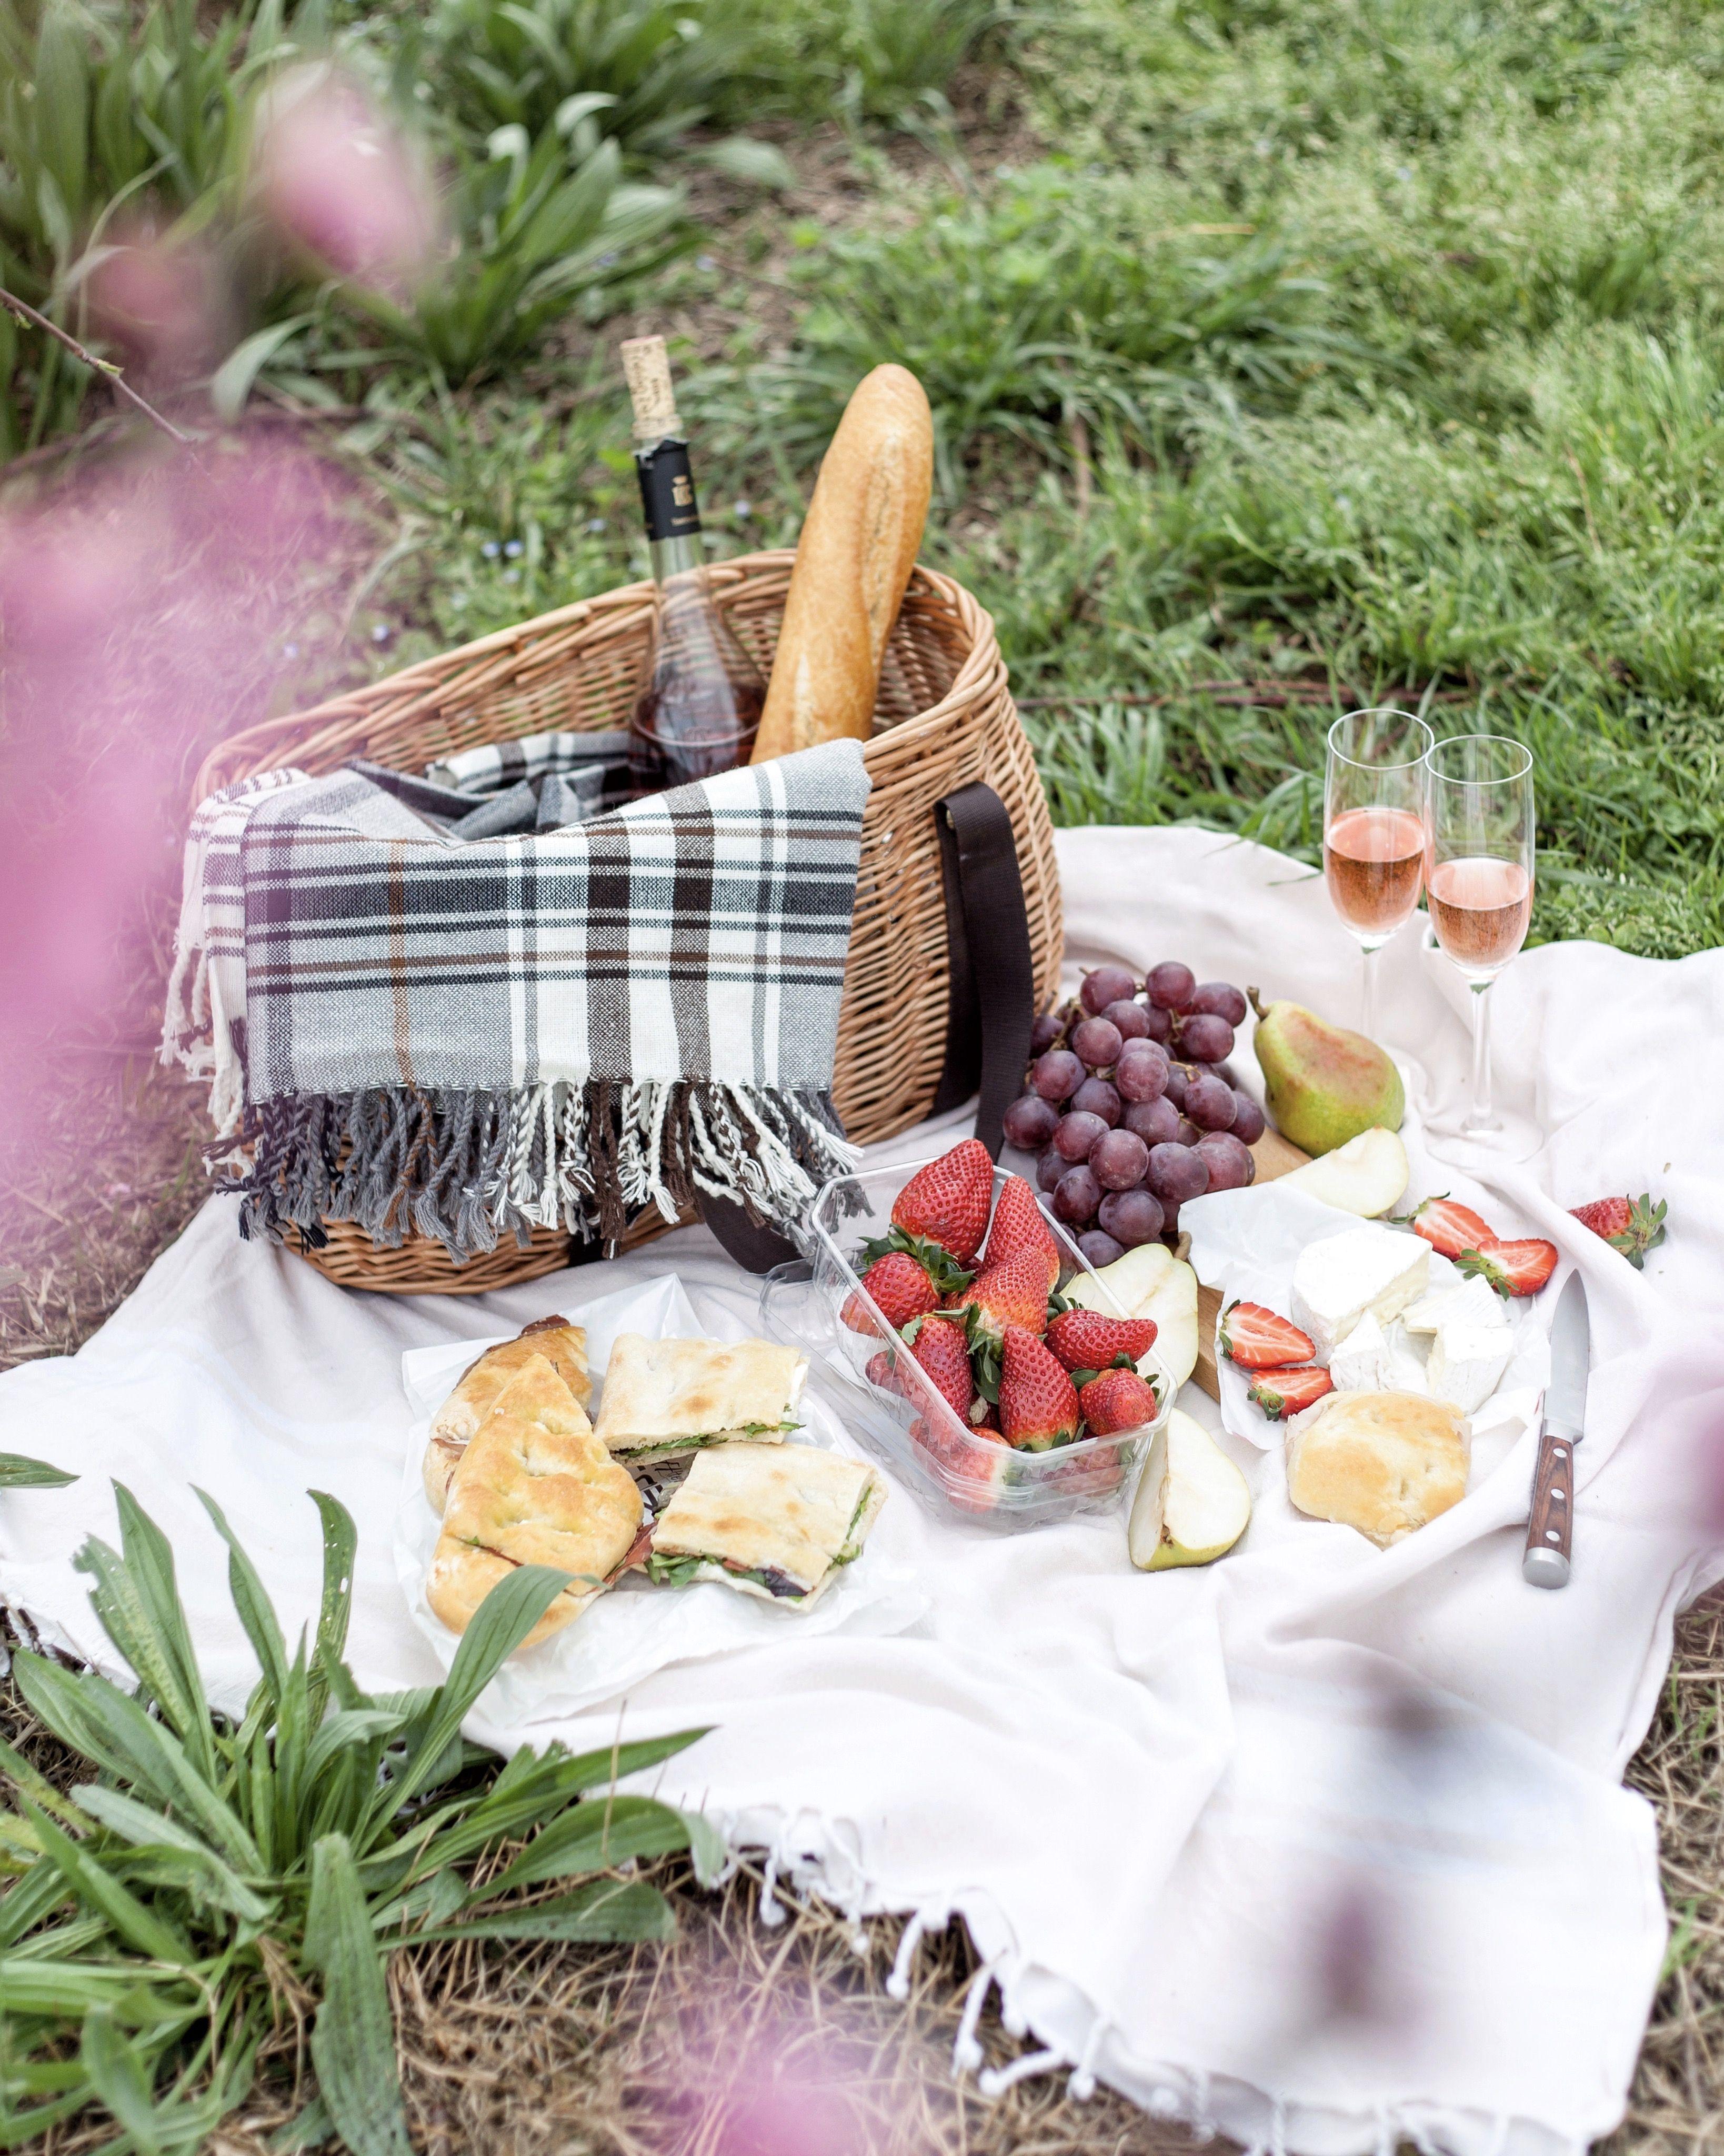 картинки пикник на траве полотенца играют большую